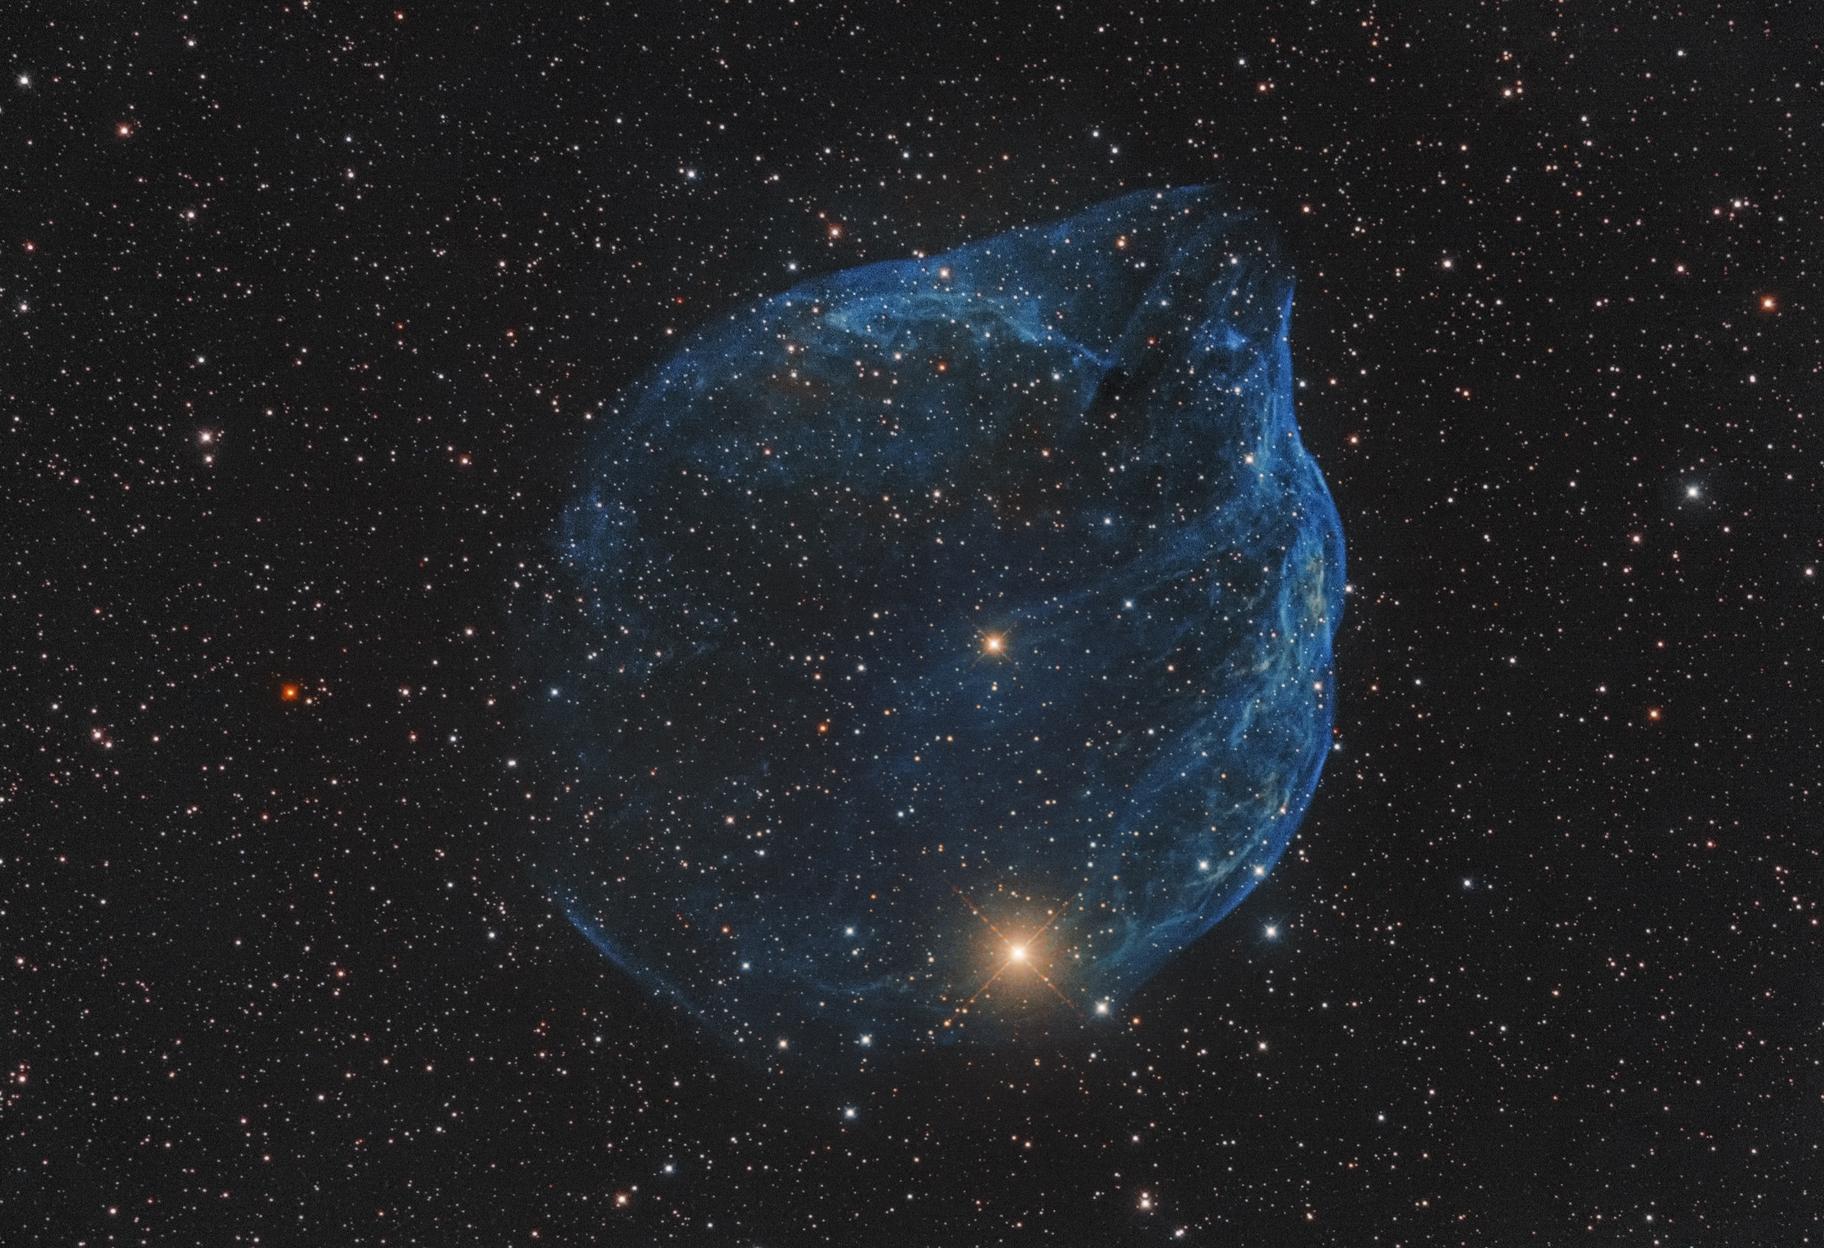 Imaging telescope or lens:Takahashi CCA250 Imaging camera:QHYCCD QHY600 Mount:Skywatcher EQ8 Guiding telescope or lens:Takahashi GT-40 Guiding camera:Starlight Xpress Lodestar2 Software:MaximDL 6,  Adobe Photoship CC 2017,  FlatAidePro Resolution: 4096x2802 Dates:Dec. 8, 2019  Frames: Astrodon H-alpha 5nm: 15x600` (gain: 26.00) -20C  Astrodon O3 5nm: 18x600` (gain: 26.00) -20C  Integration: 5.5 hours